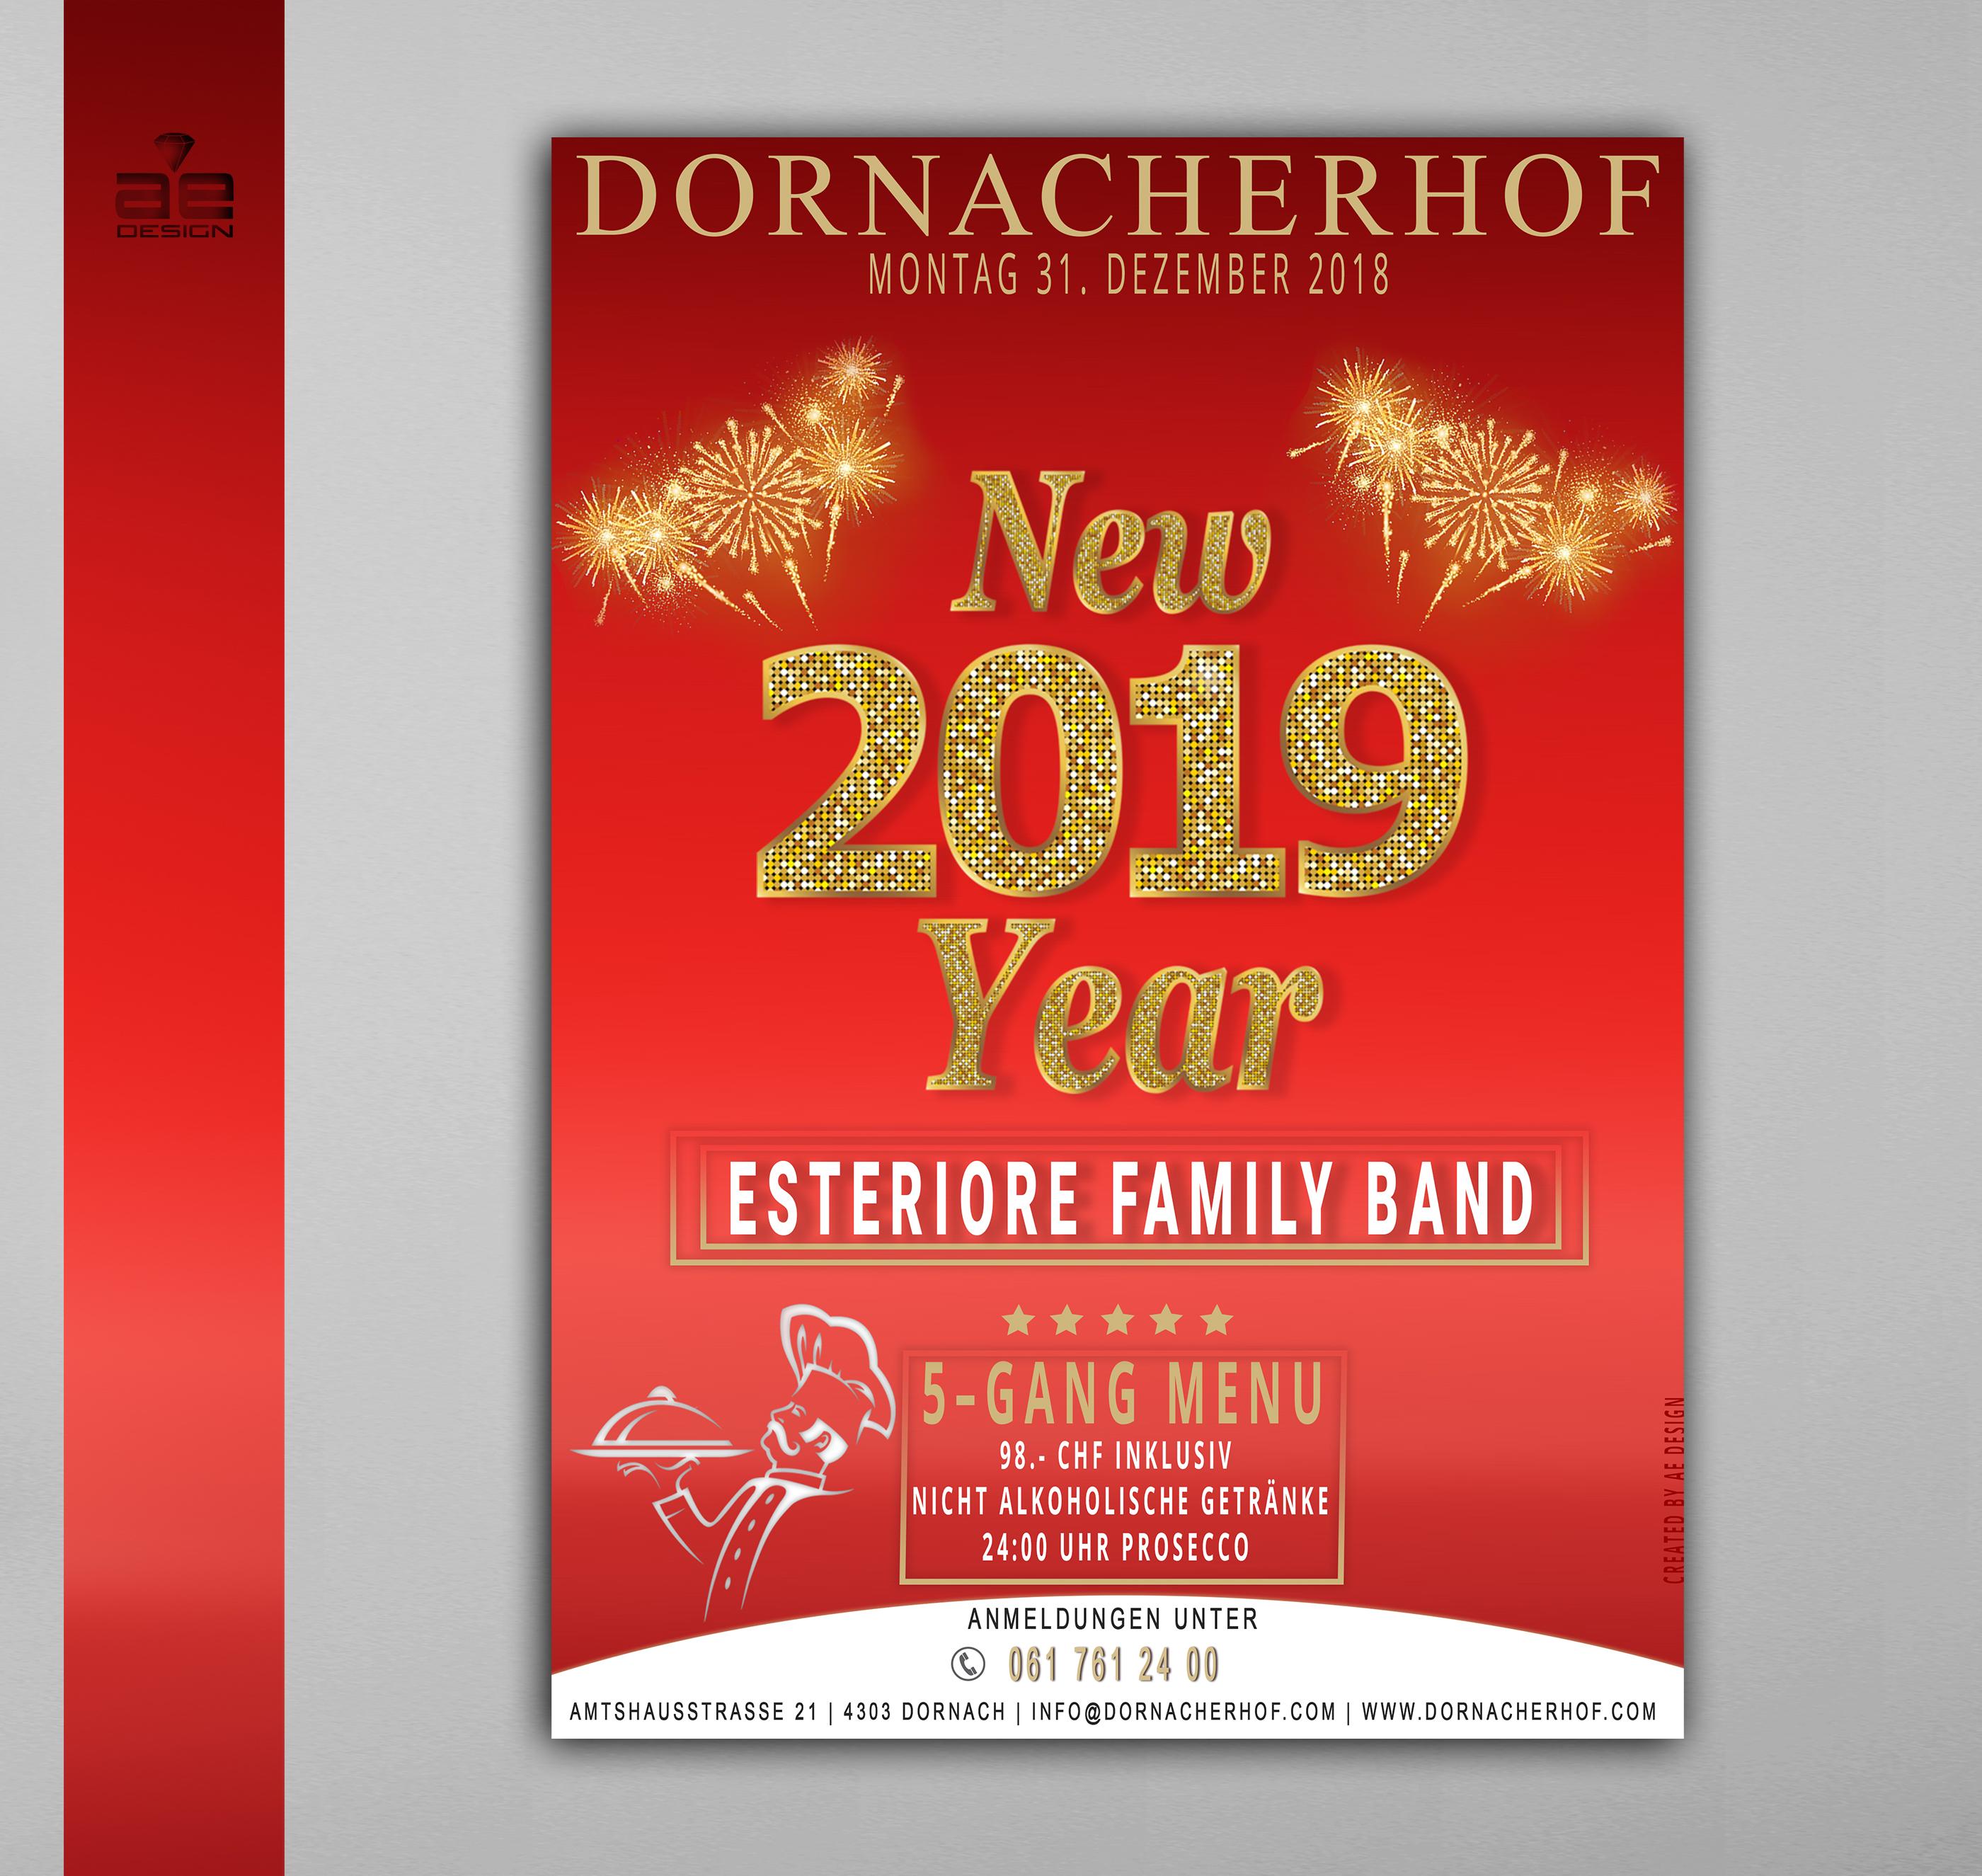 DORNACHERHOF